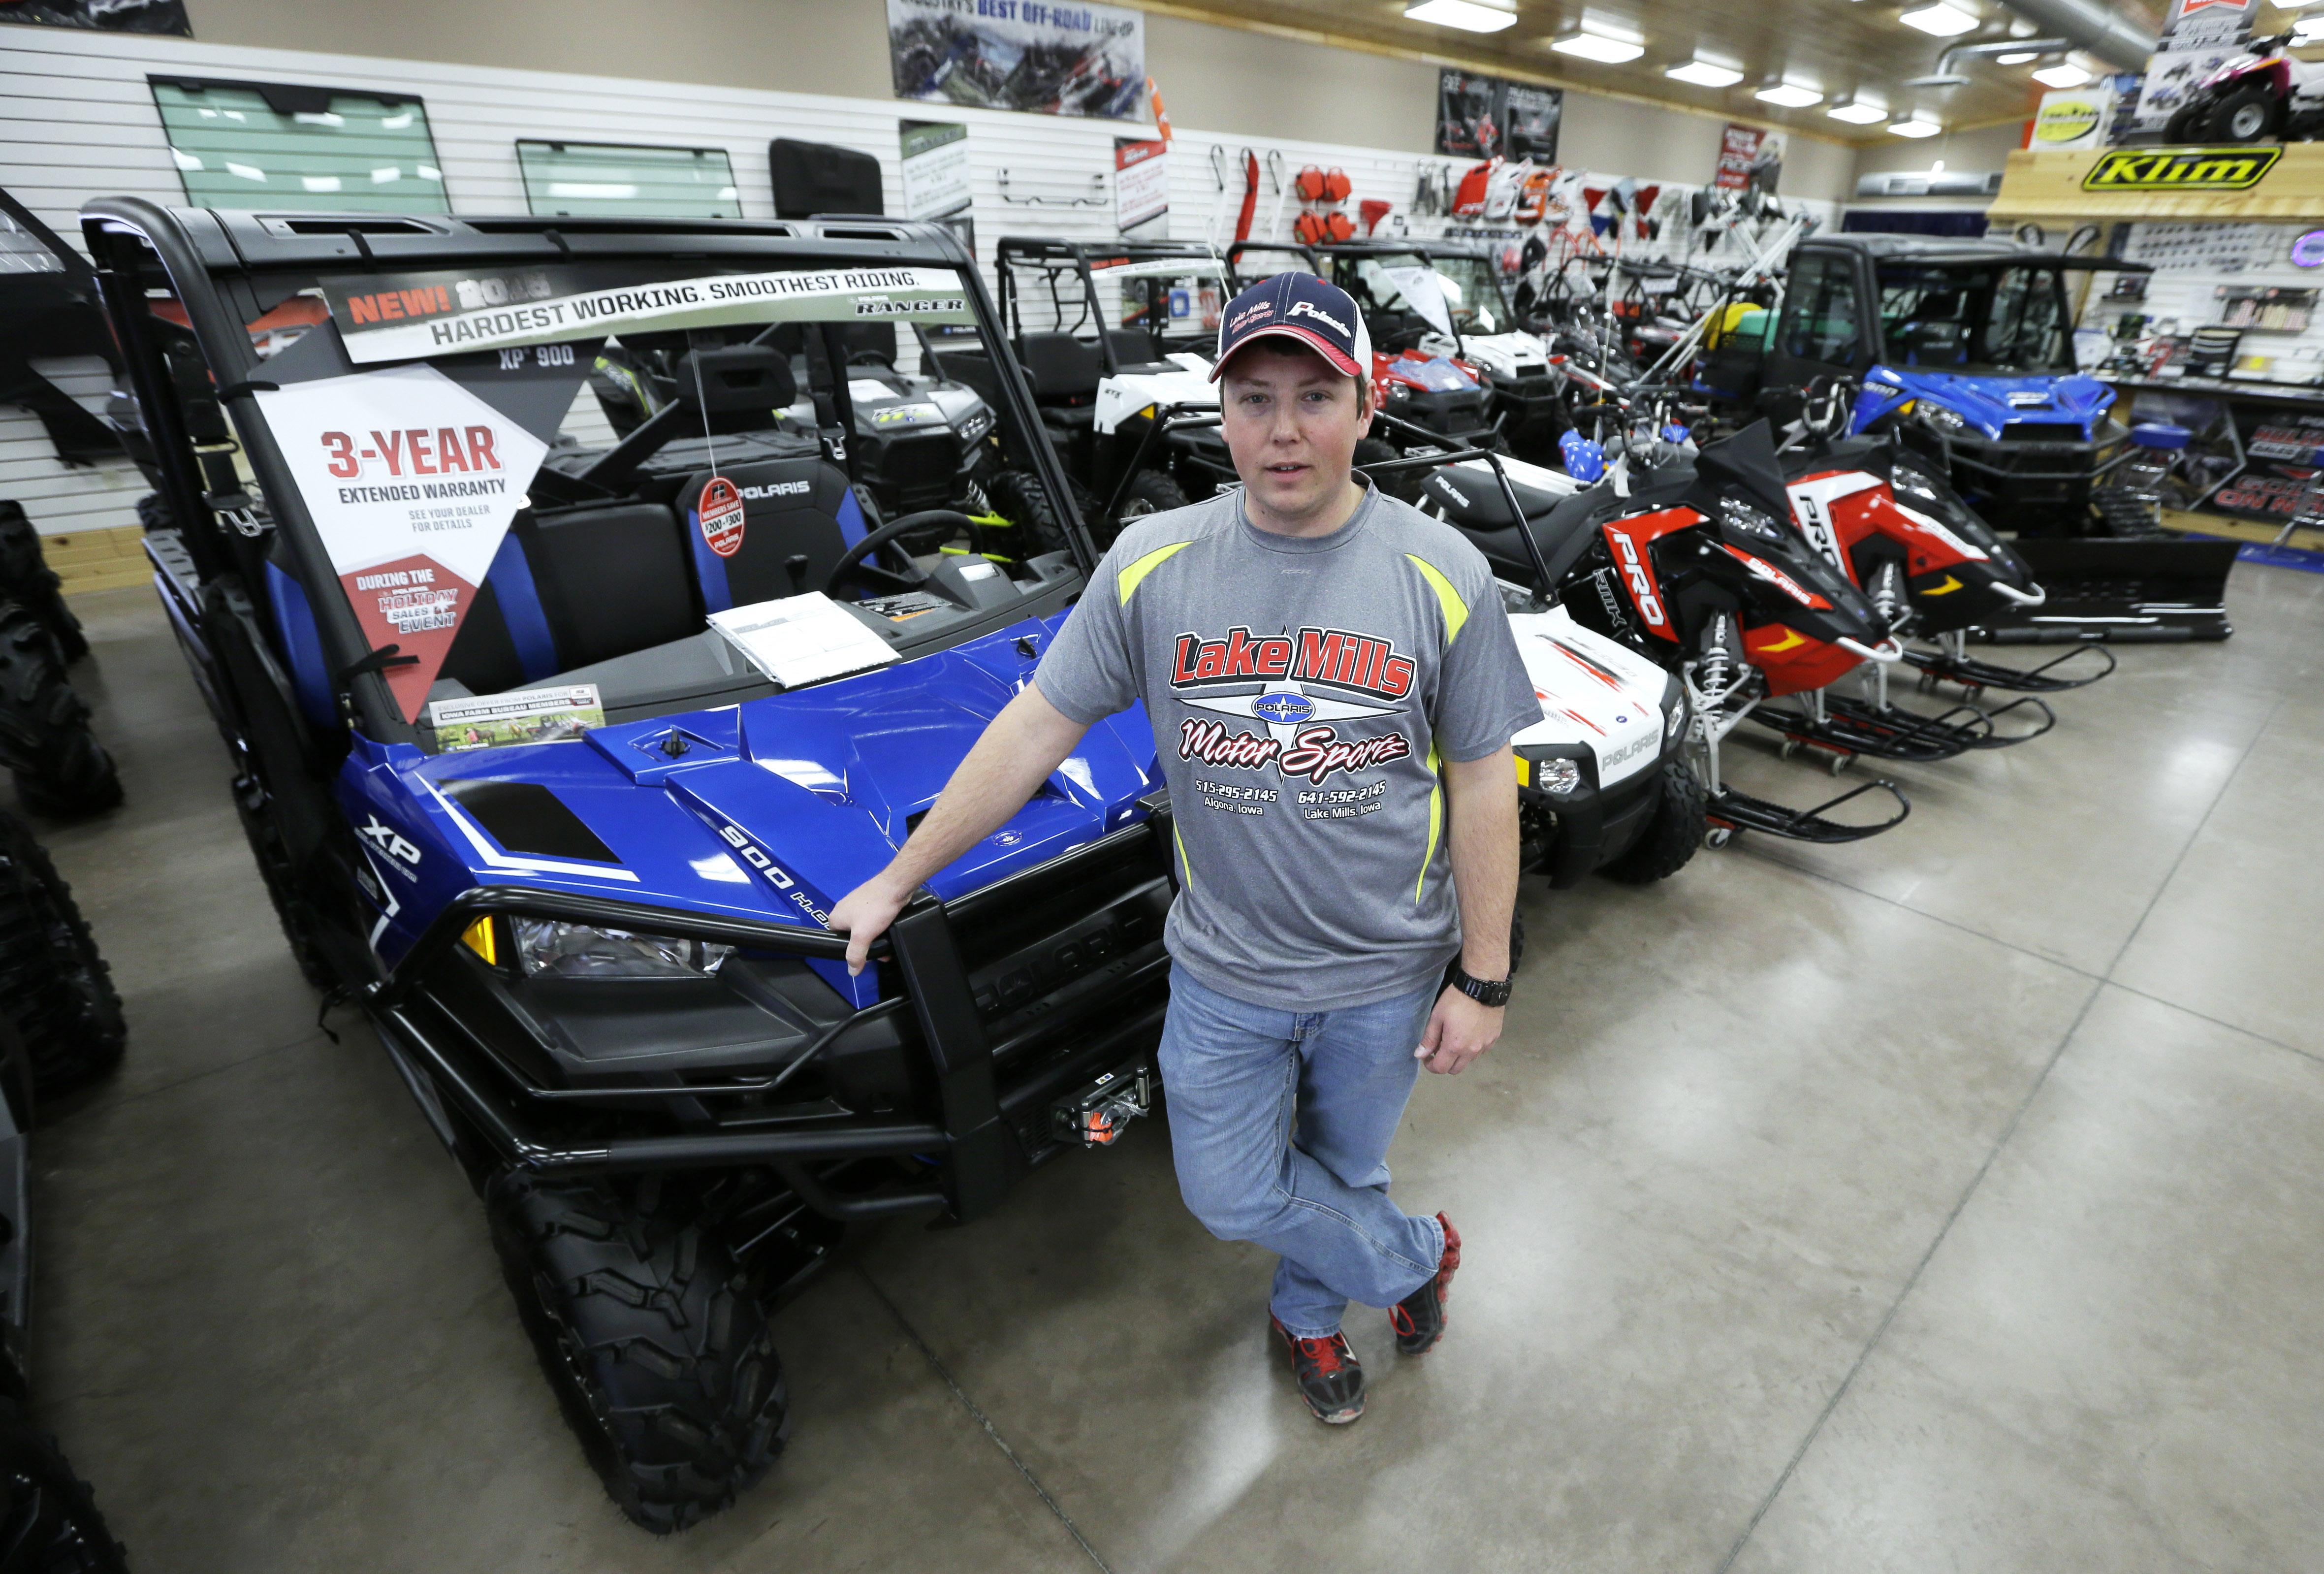 Des Moines Iowa ATV Riders Challenge Longtime Bans Use